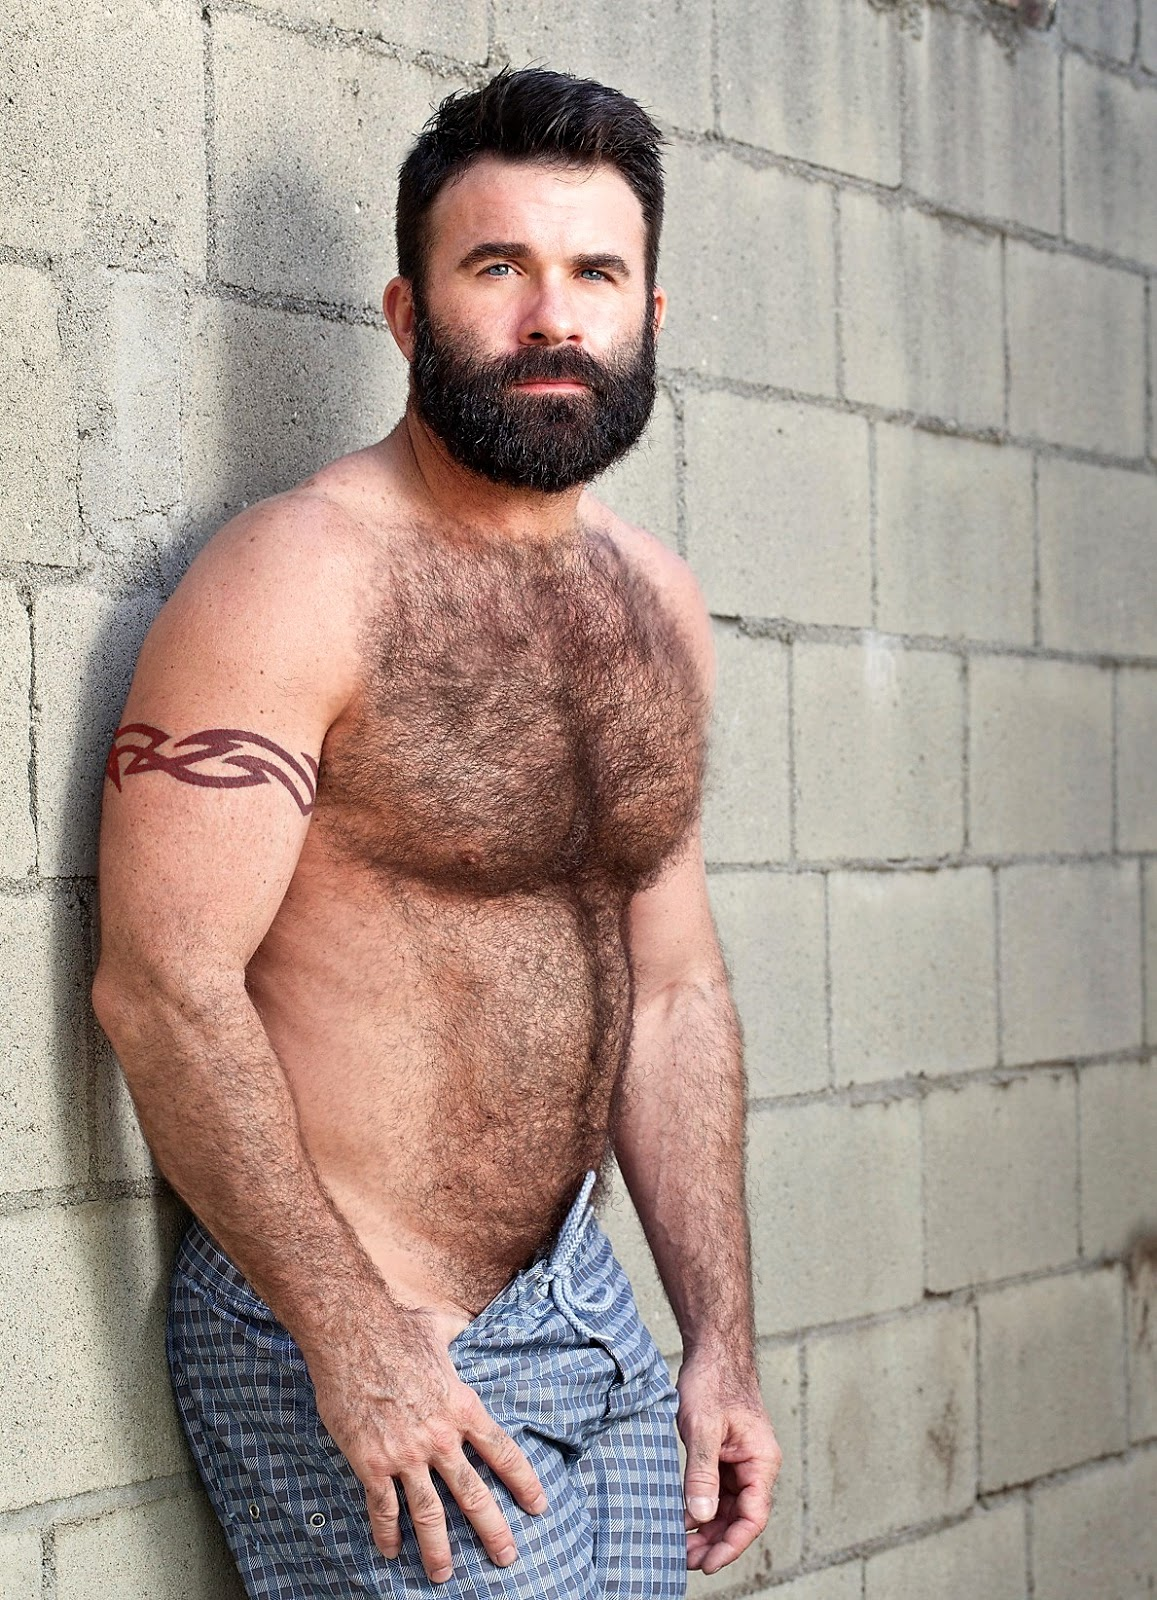 Black beard and dread nudes